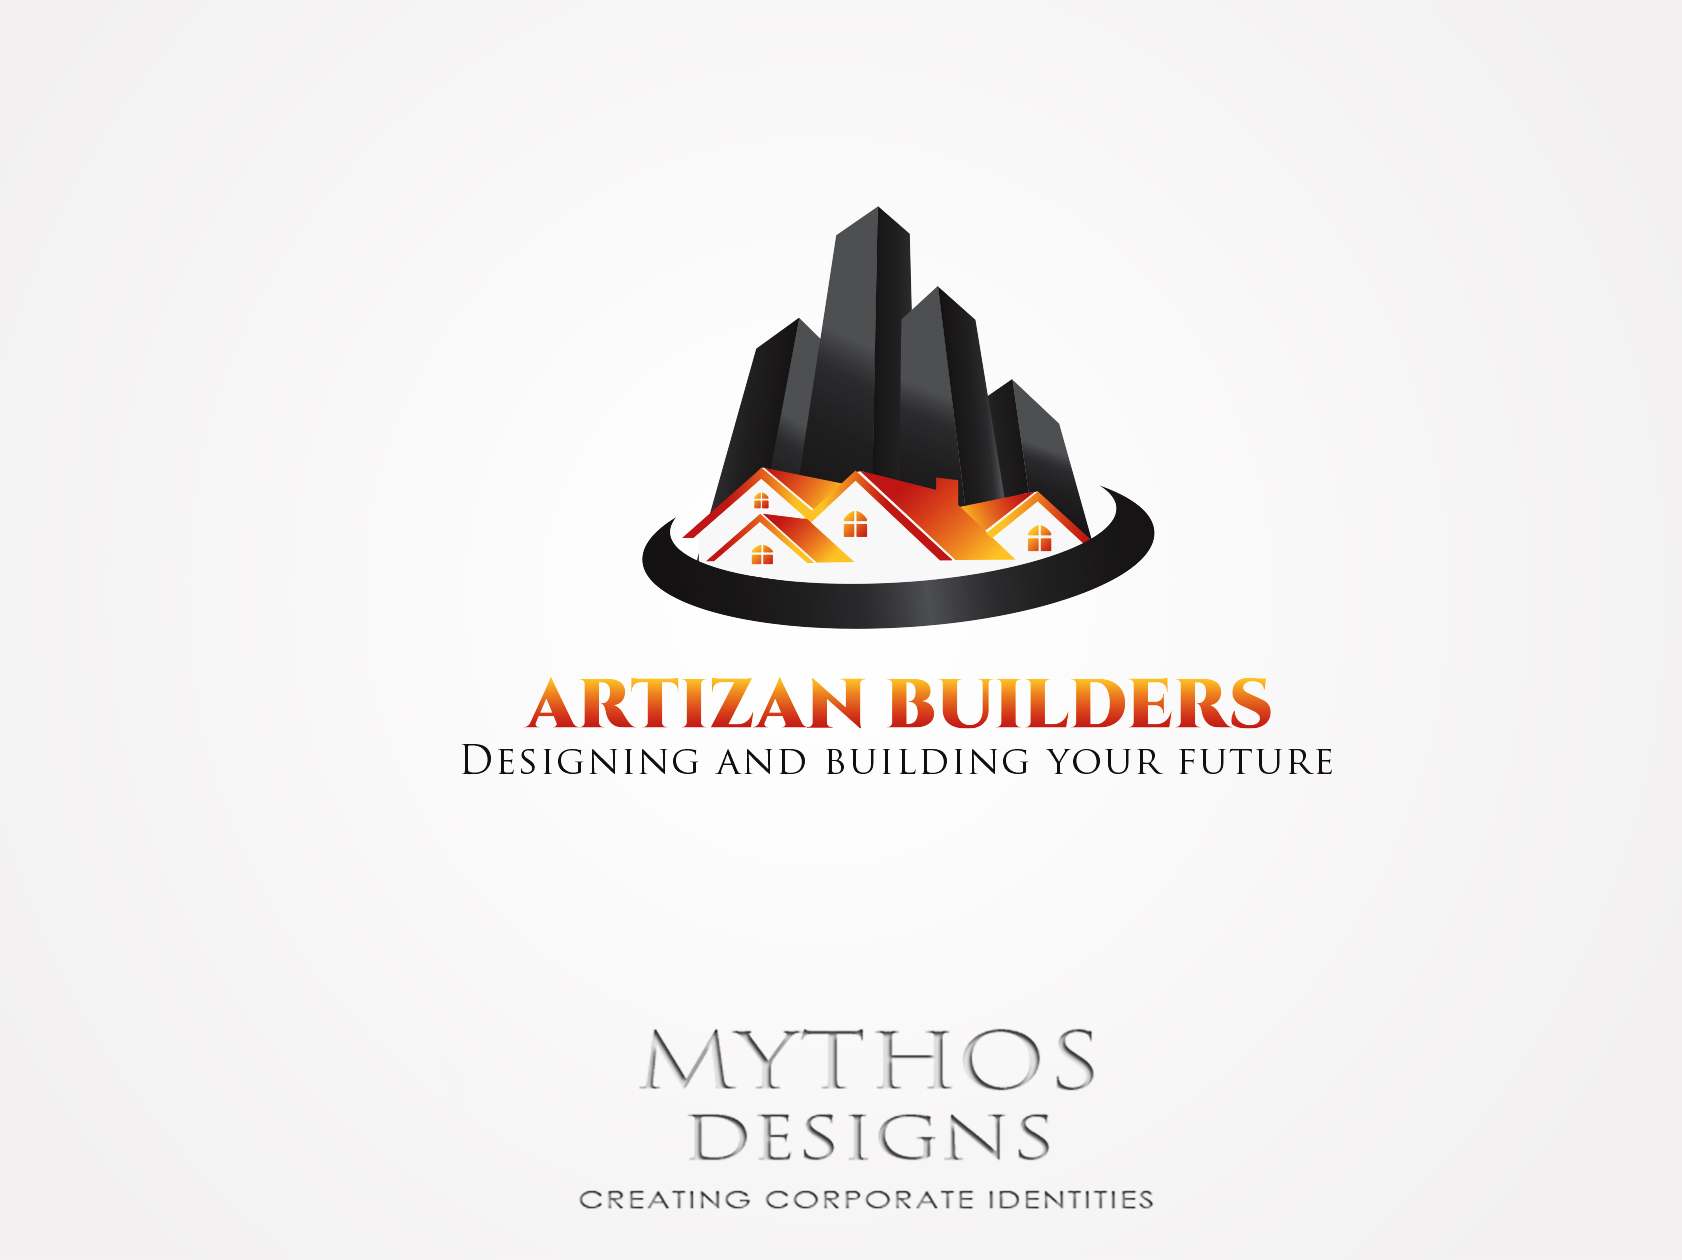 Logo Design by Mythos Designs - Entry No. 162 in the Logo Design Contest Captivating Logo Design for Artisan Builders.